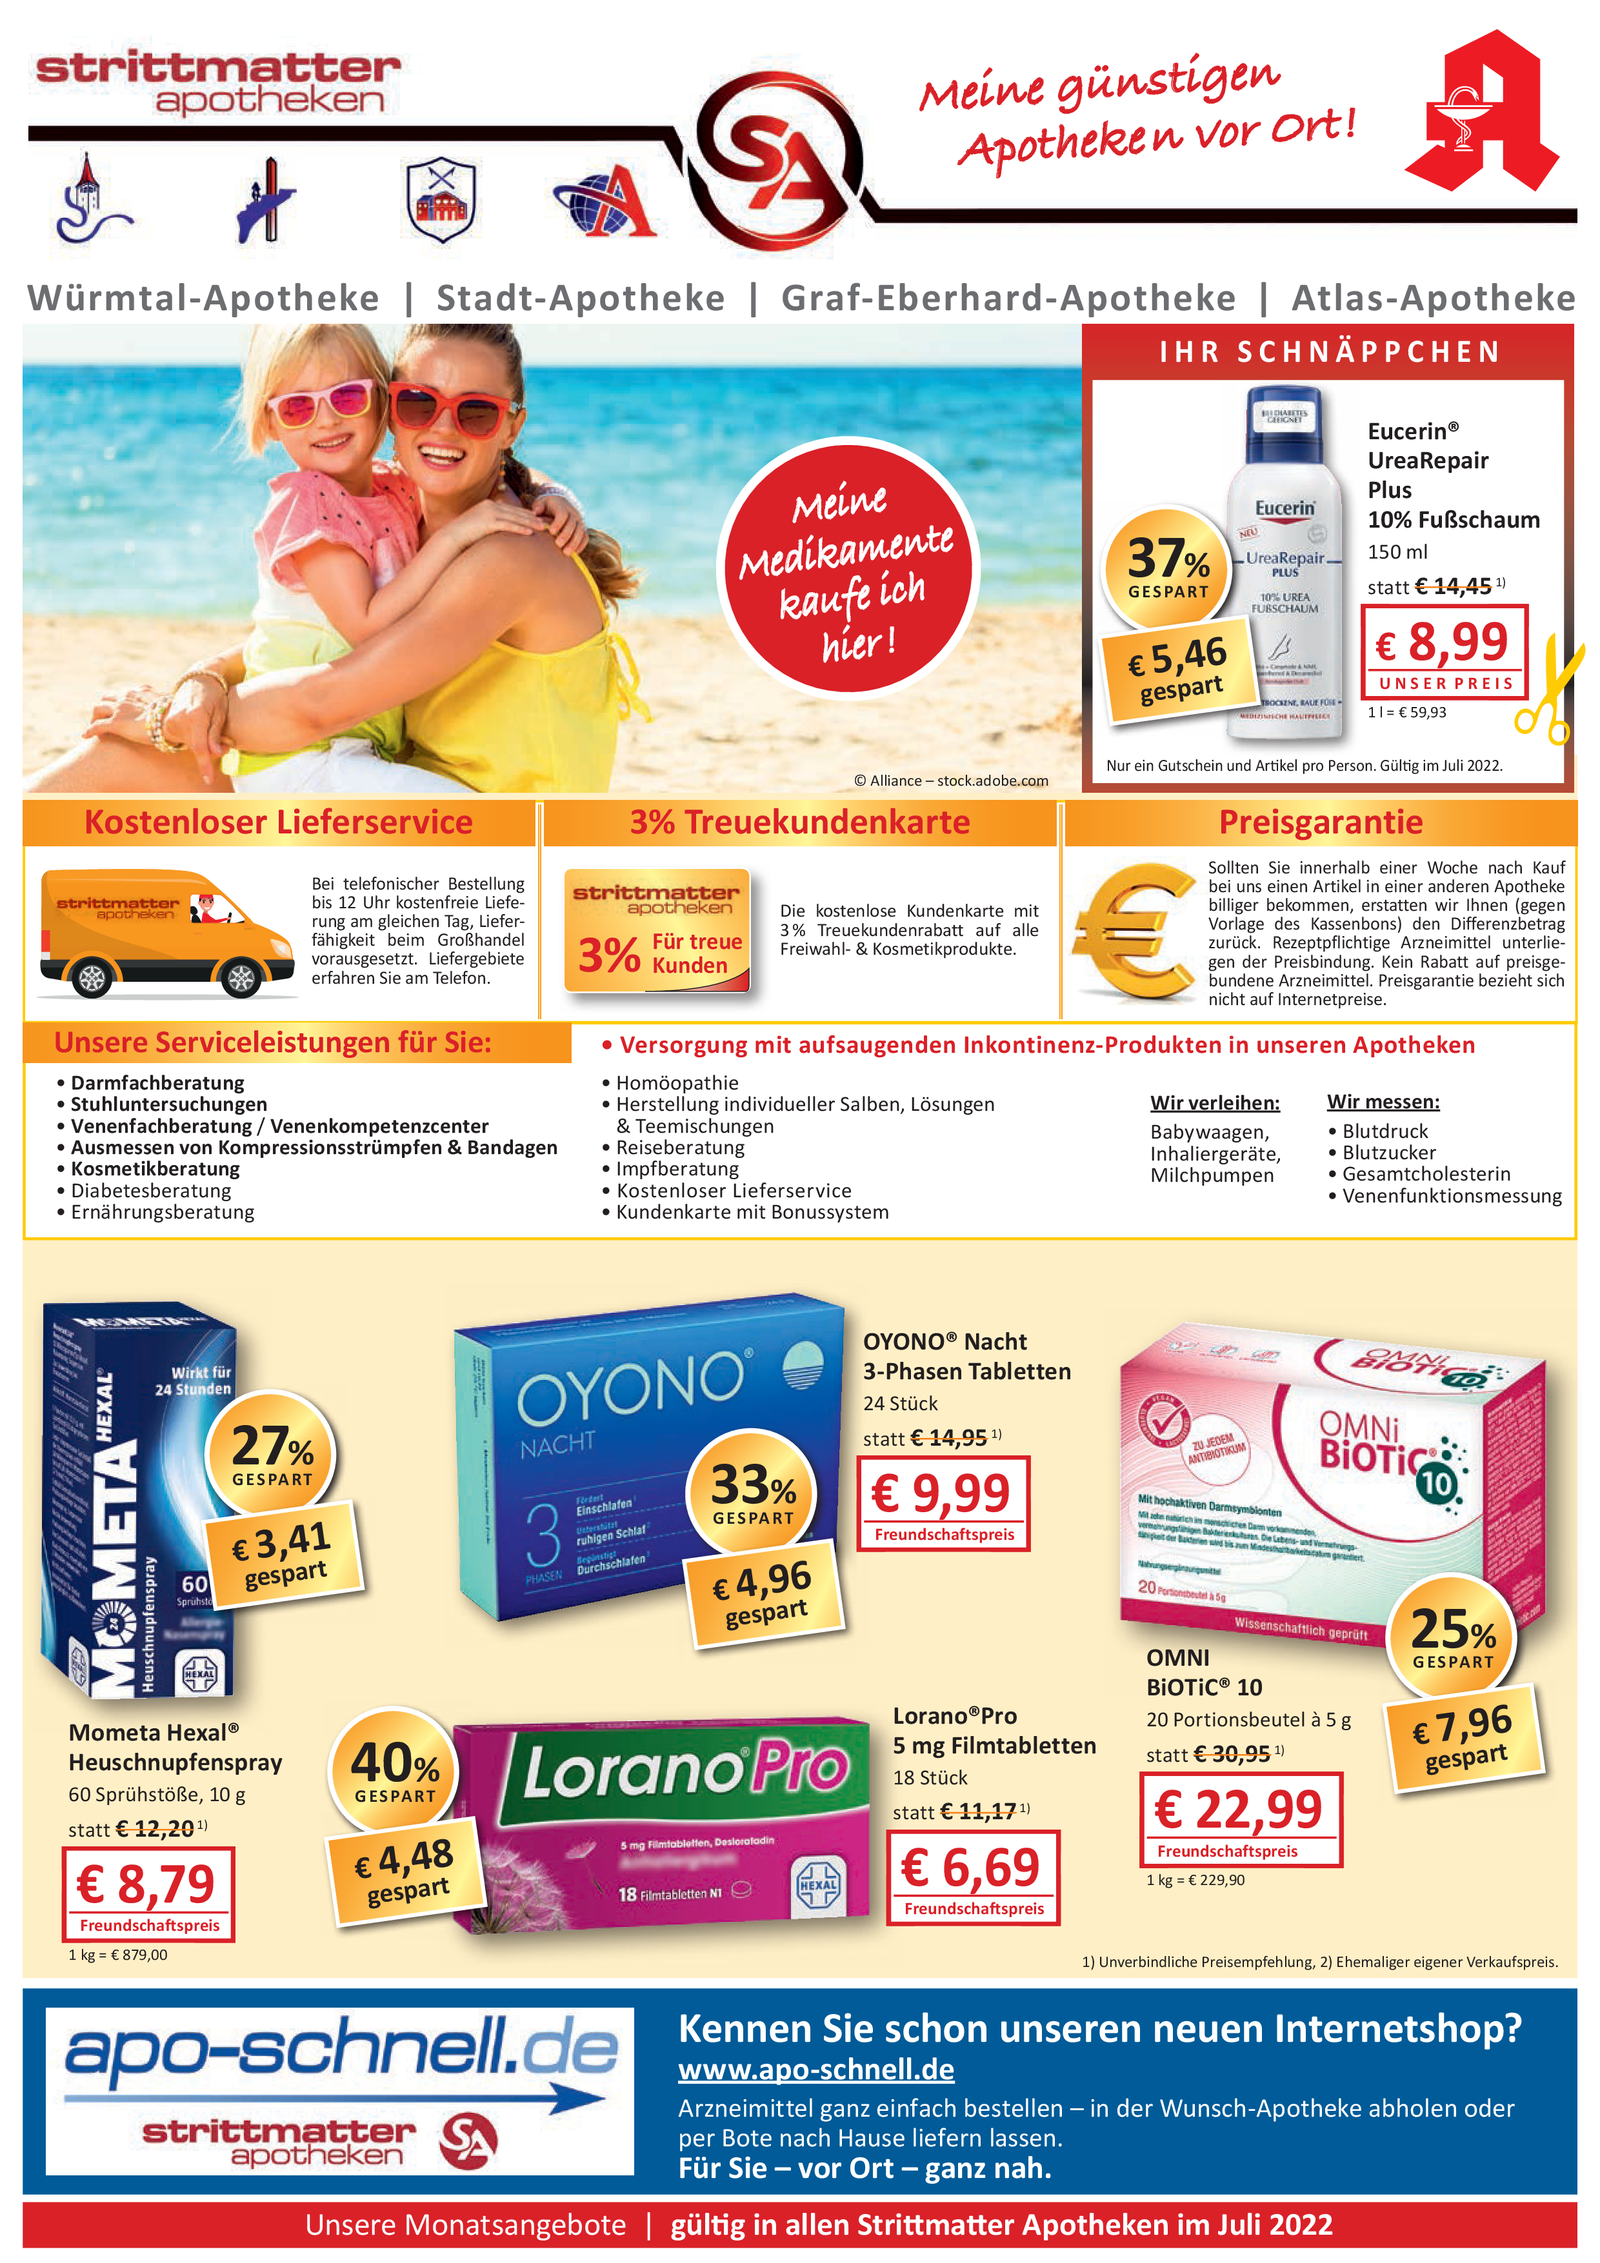 https://mein-uploads.apocdn.net/16786/leaflets/16786_flyer-Seite1.png